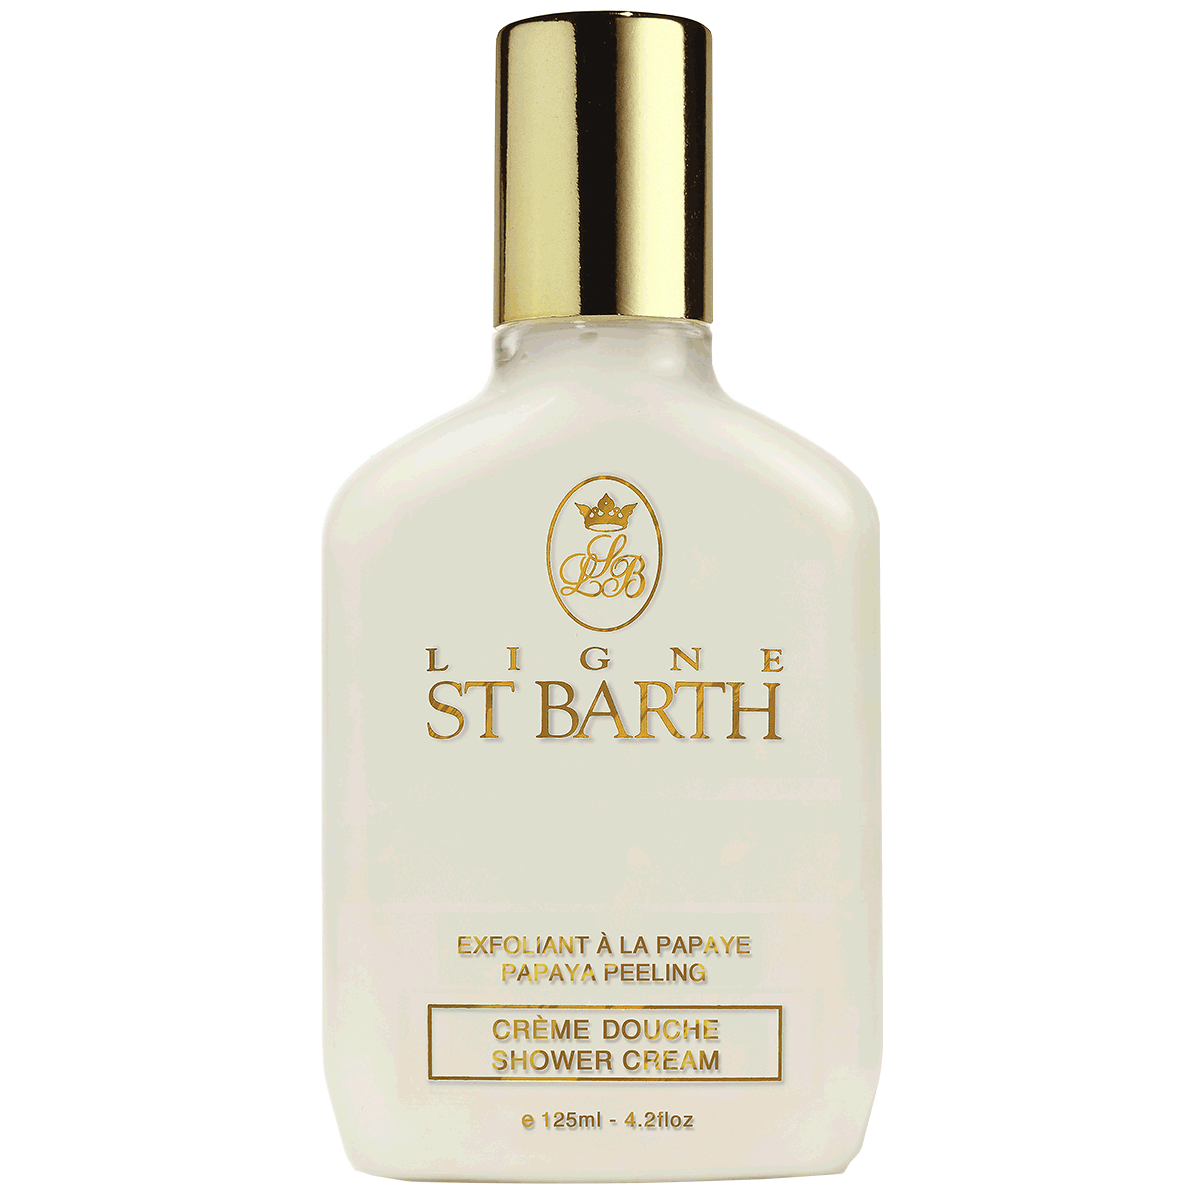 Крем-пилинг для душа St Barth Creme Douche Shower Cream Papaya Peeling 125мл